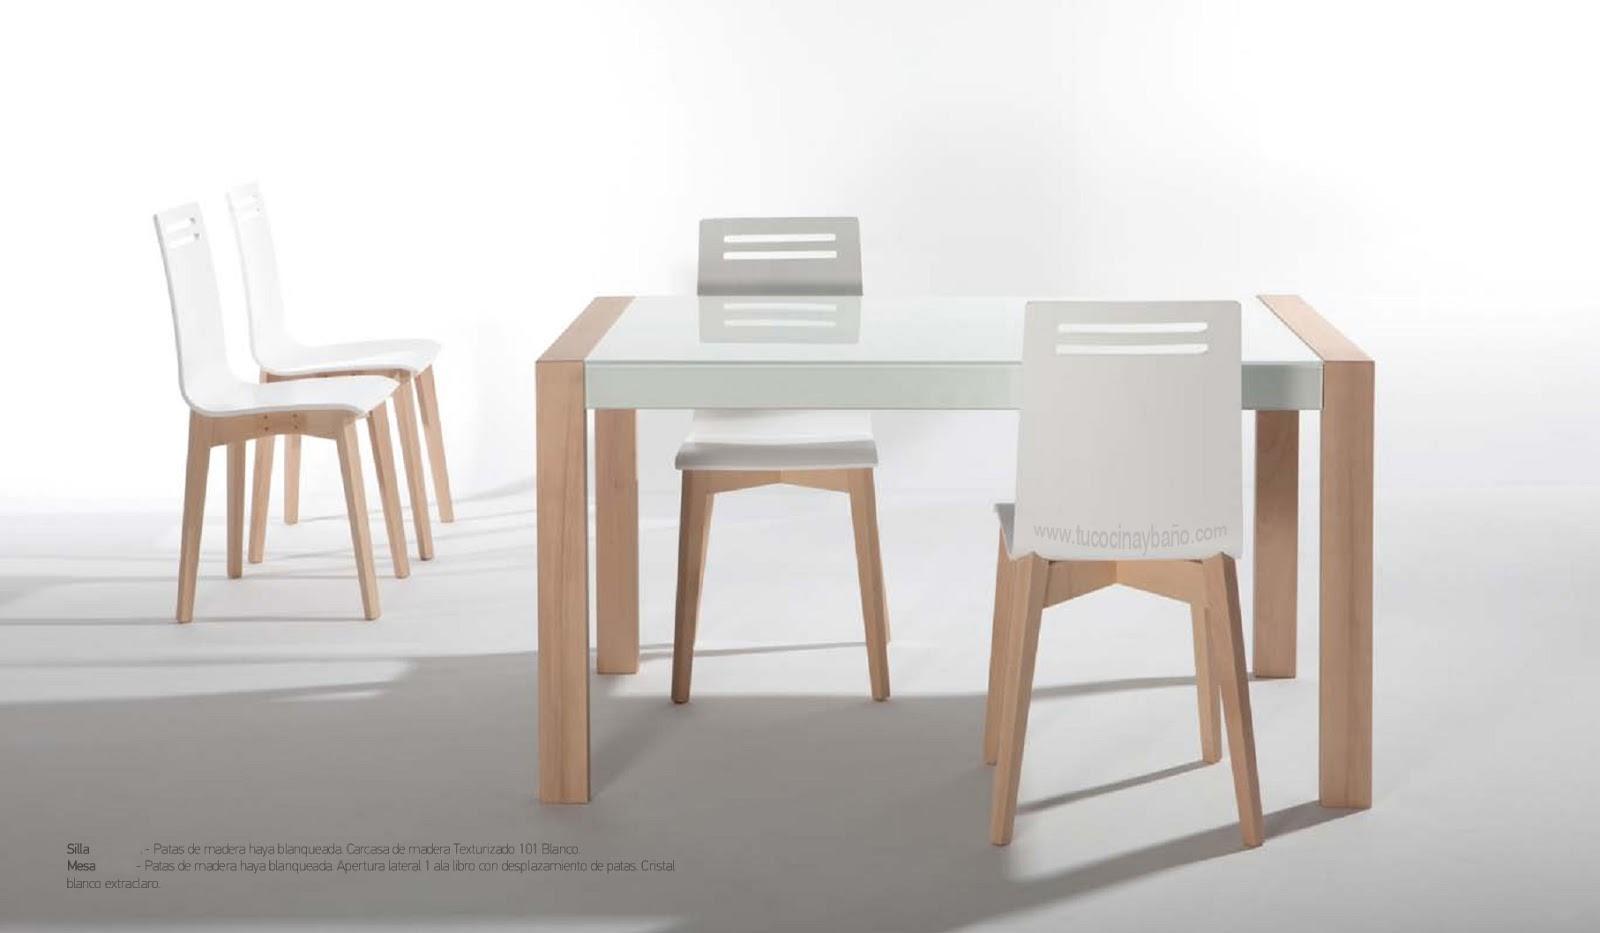 Silla cocina nordica ribalta tu cocina y ba o for Sillas de cocina blancas de madera